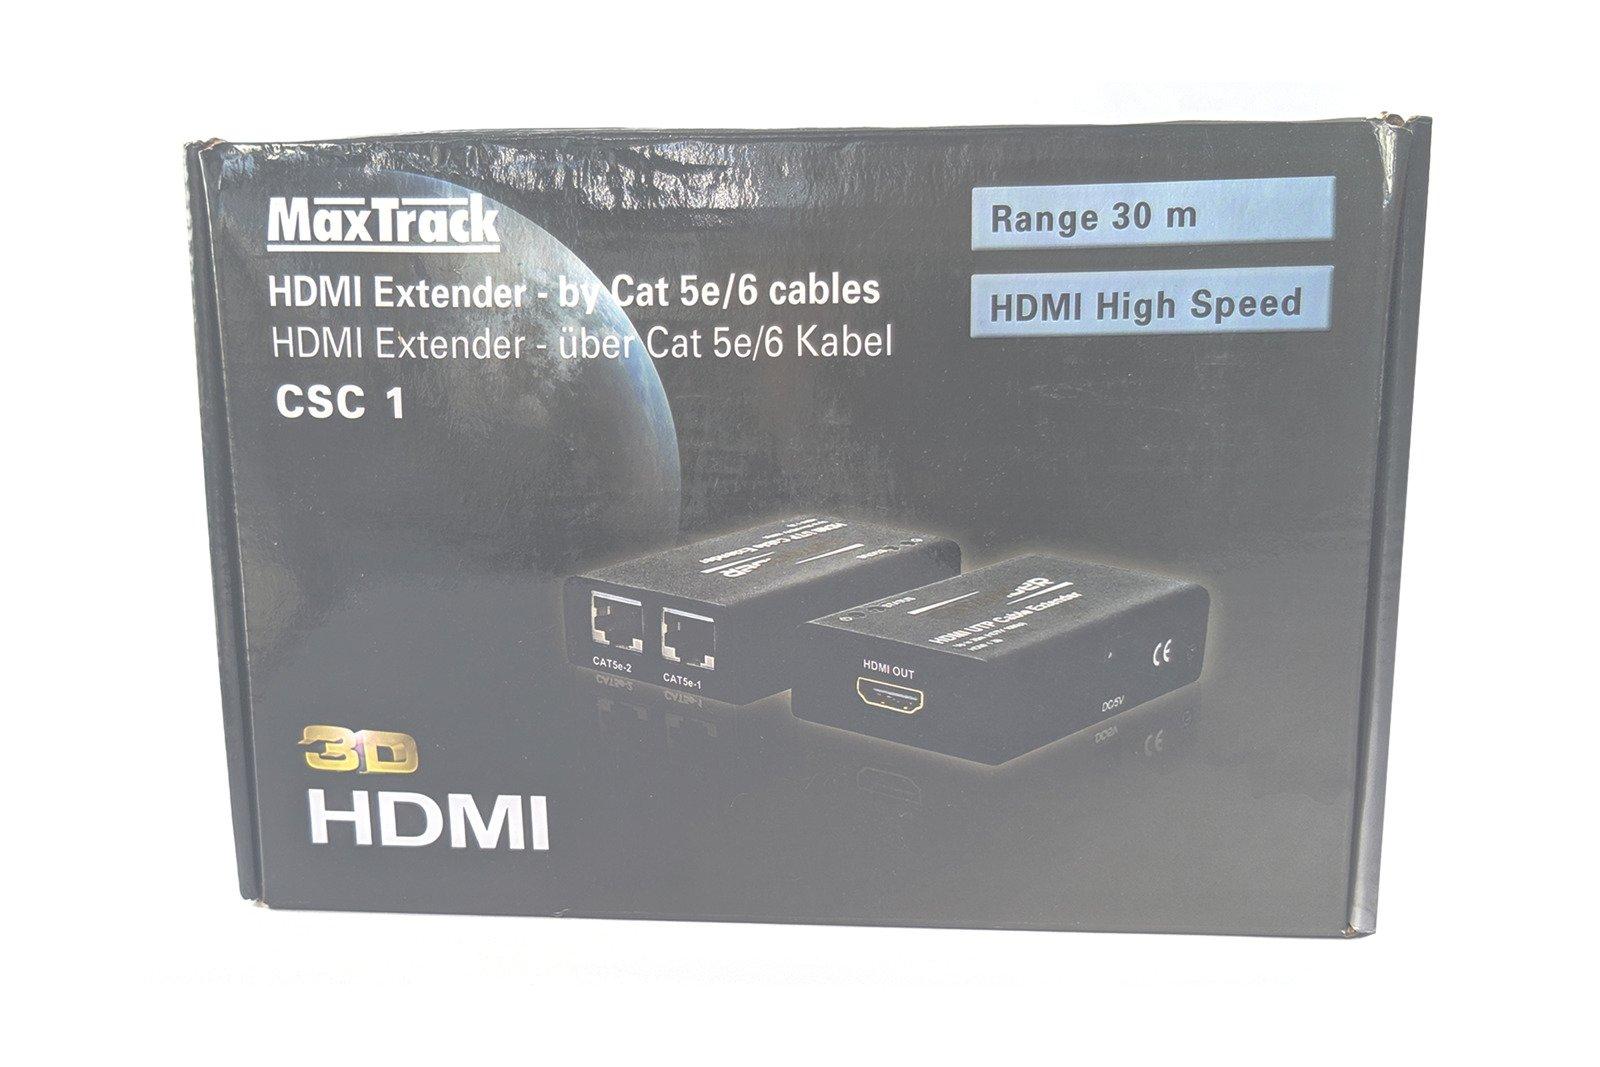 MaxTrack CSC1L High Speed HDMI Extender 30m